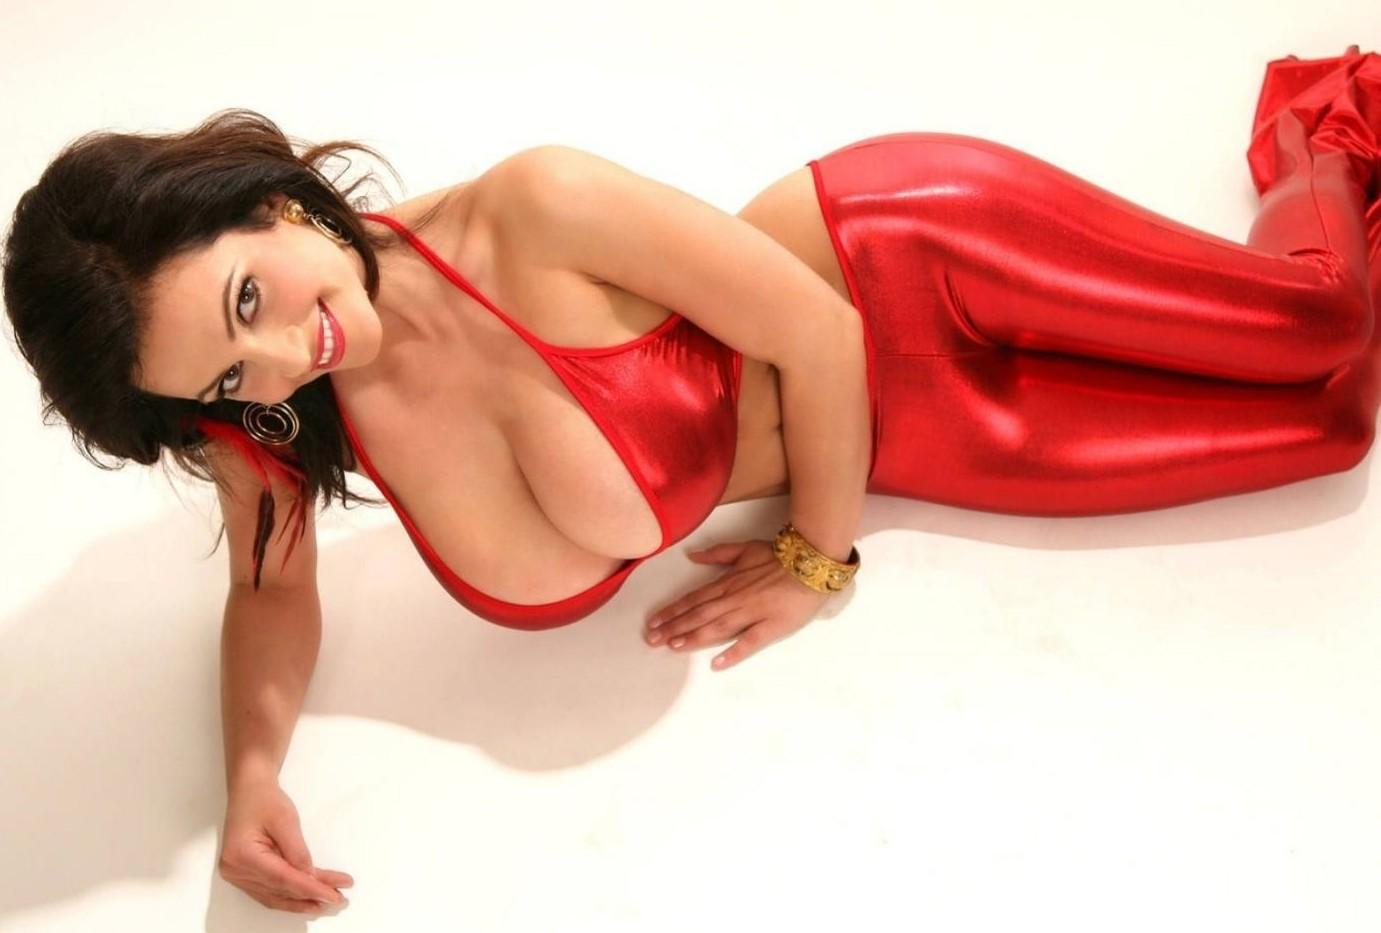 sexy_busty_girl_173